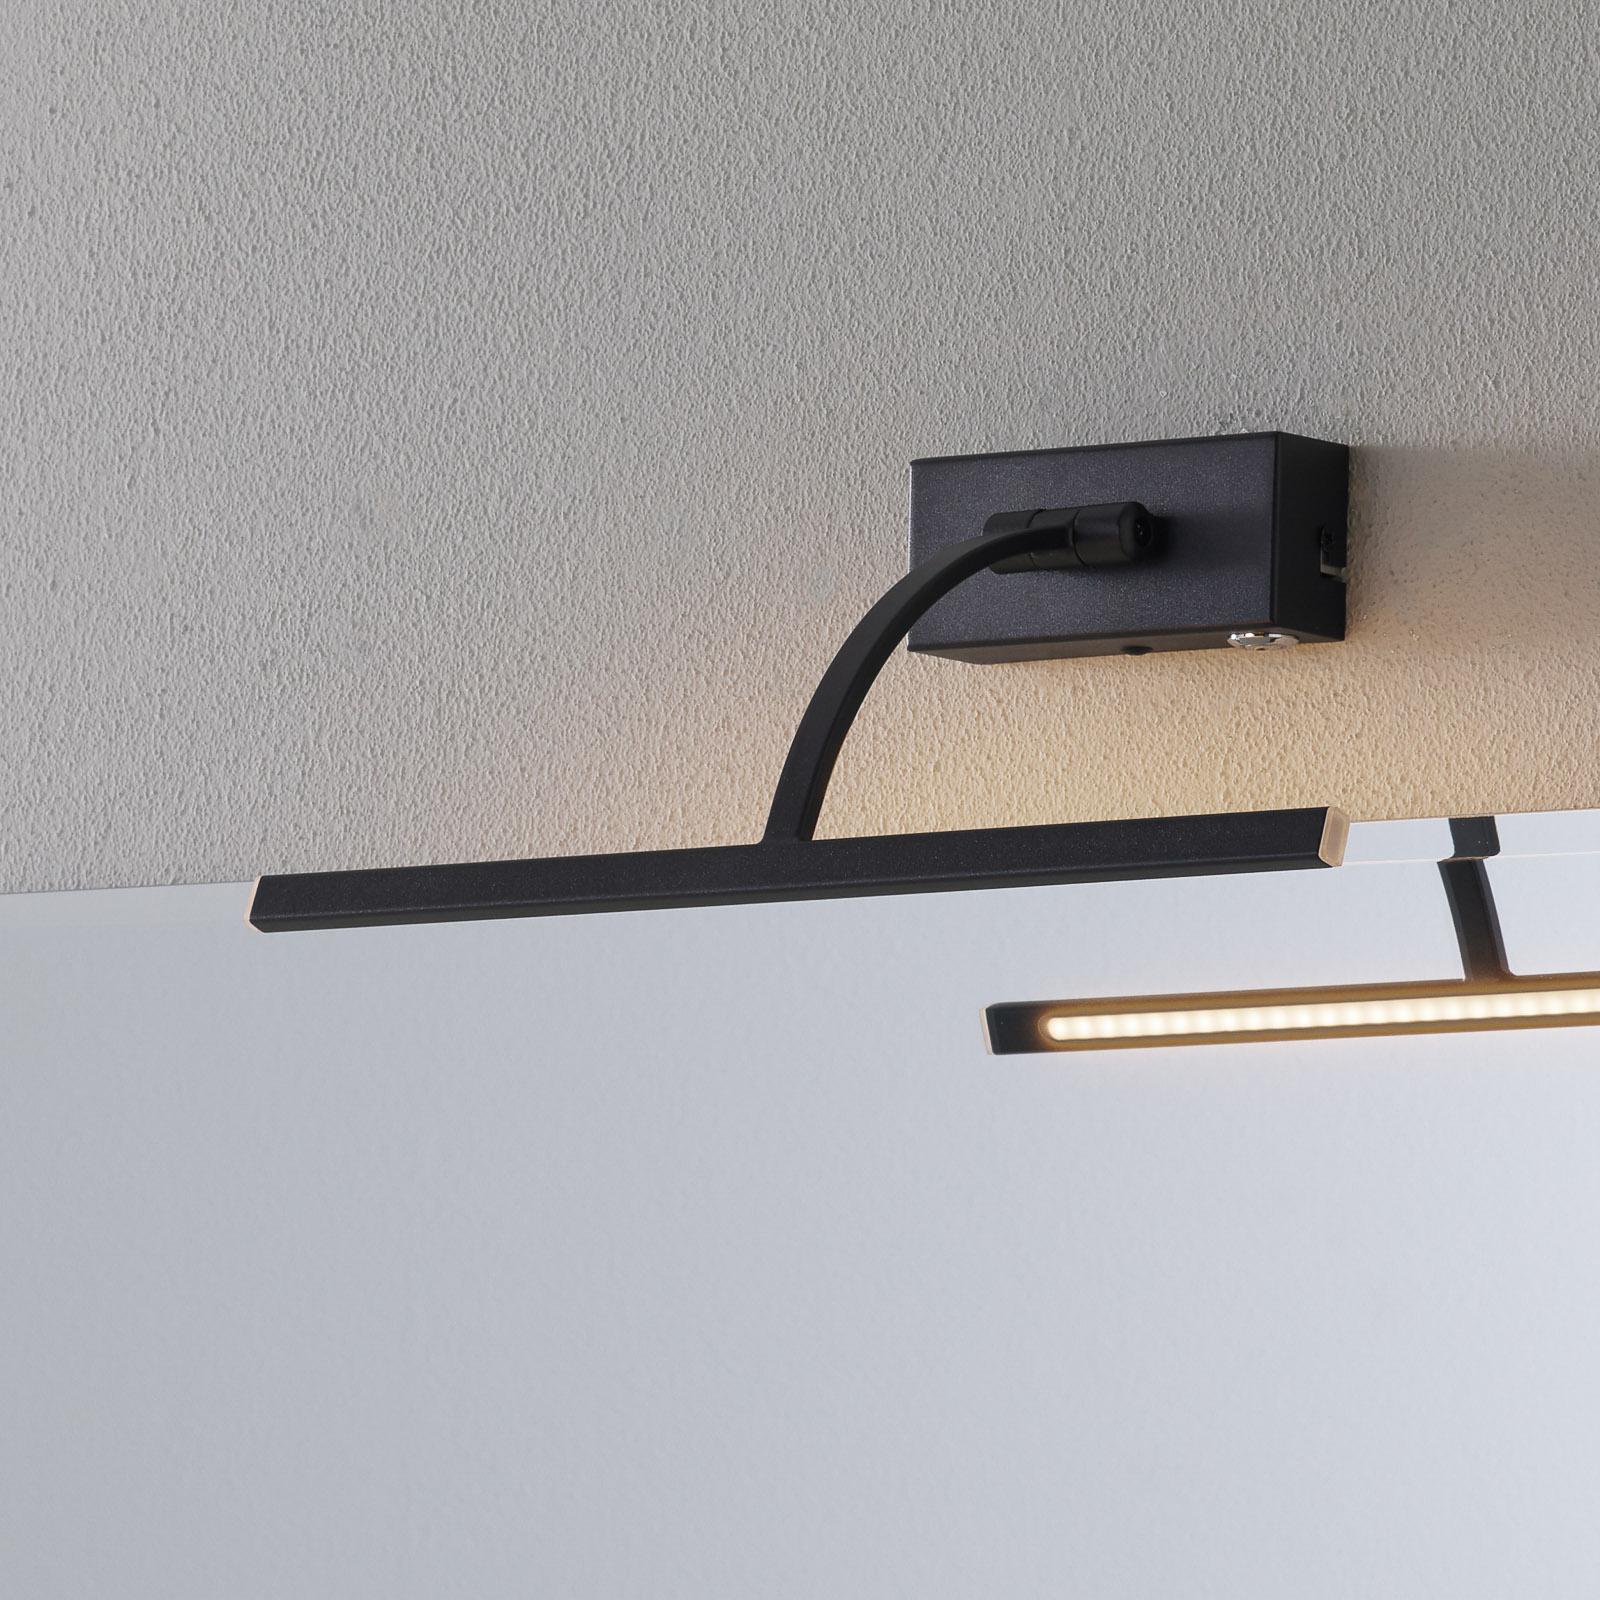 LED wandlamp Matisse, breedte 34 cm, zwart